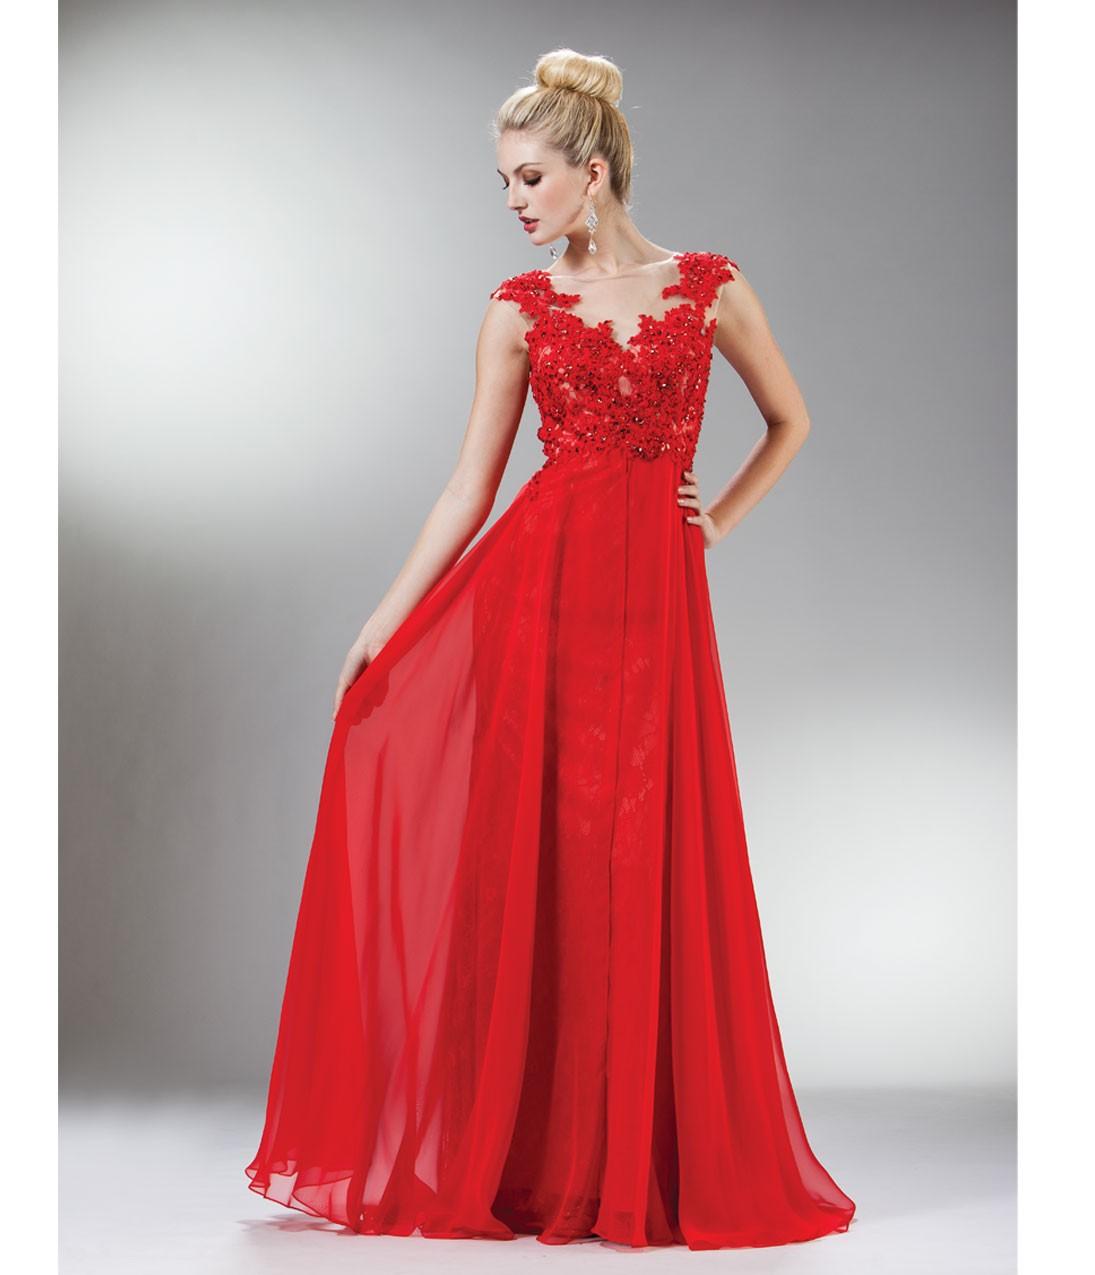 Prom_Dresses-Red_Beaded_Lace_Mesh_Cap_Sleeve_Long_Dress